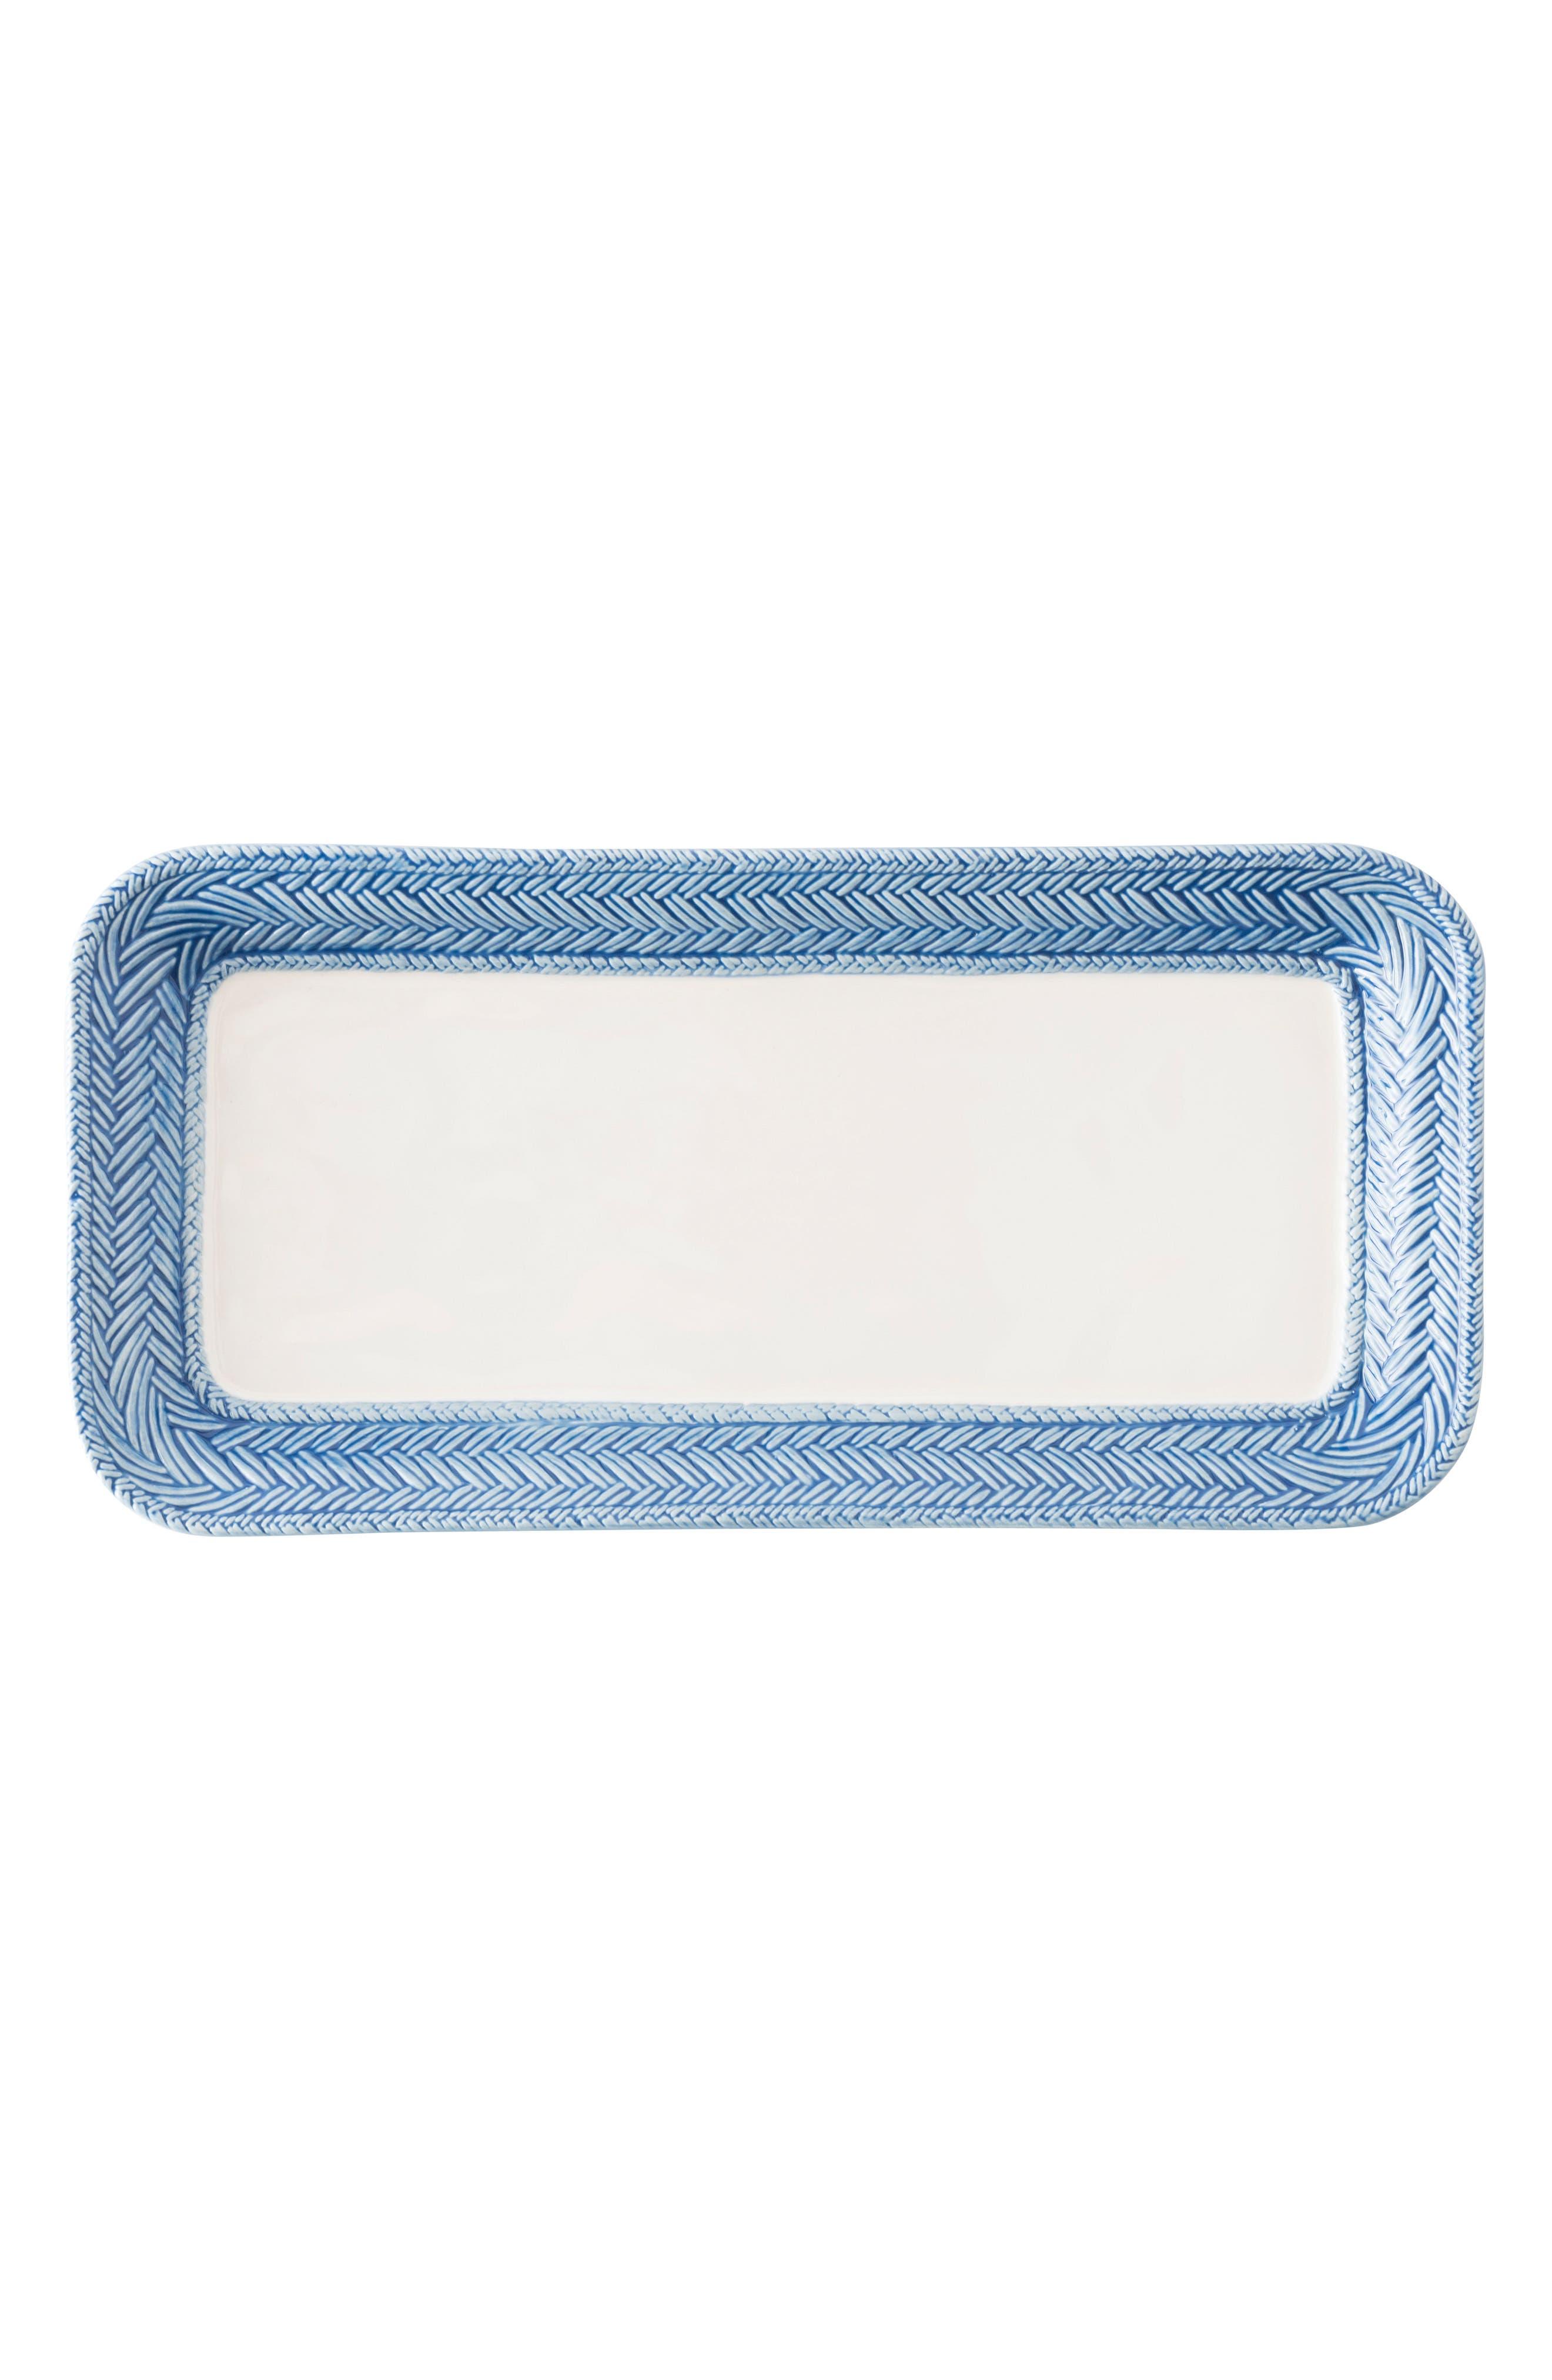 Le Panier Stoneware Hostess Tray,                         Main,                         color, Whitewash/ Delft Blue